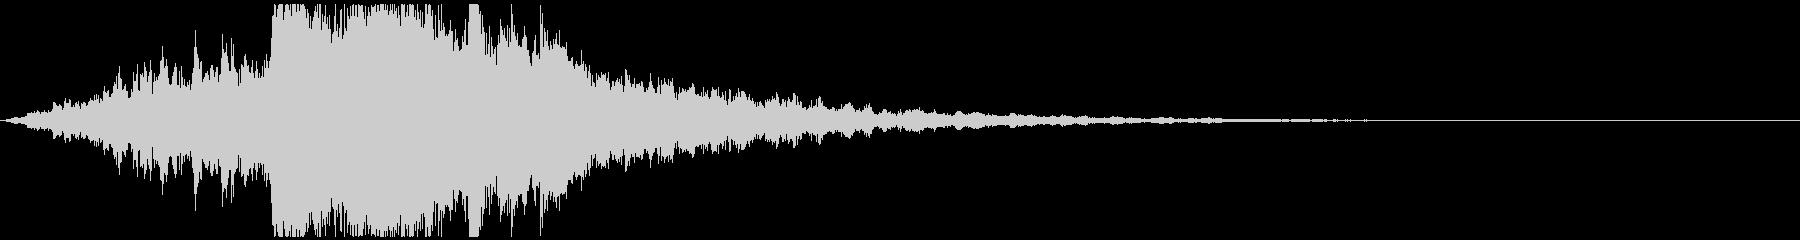 VP映像など 幻想的ピアノサウンドロゴの未再生の波形